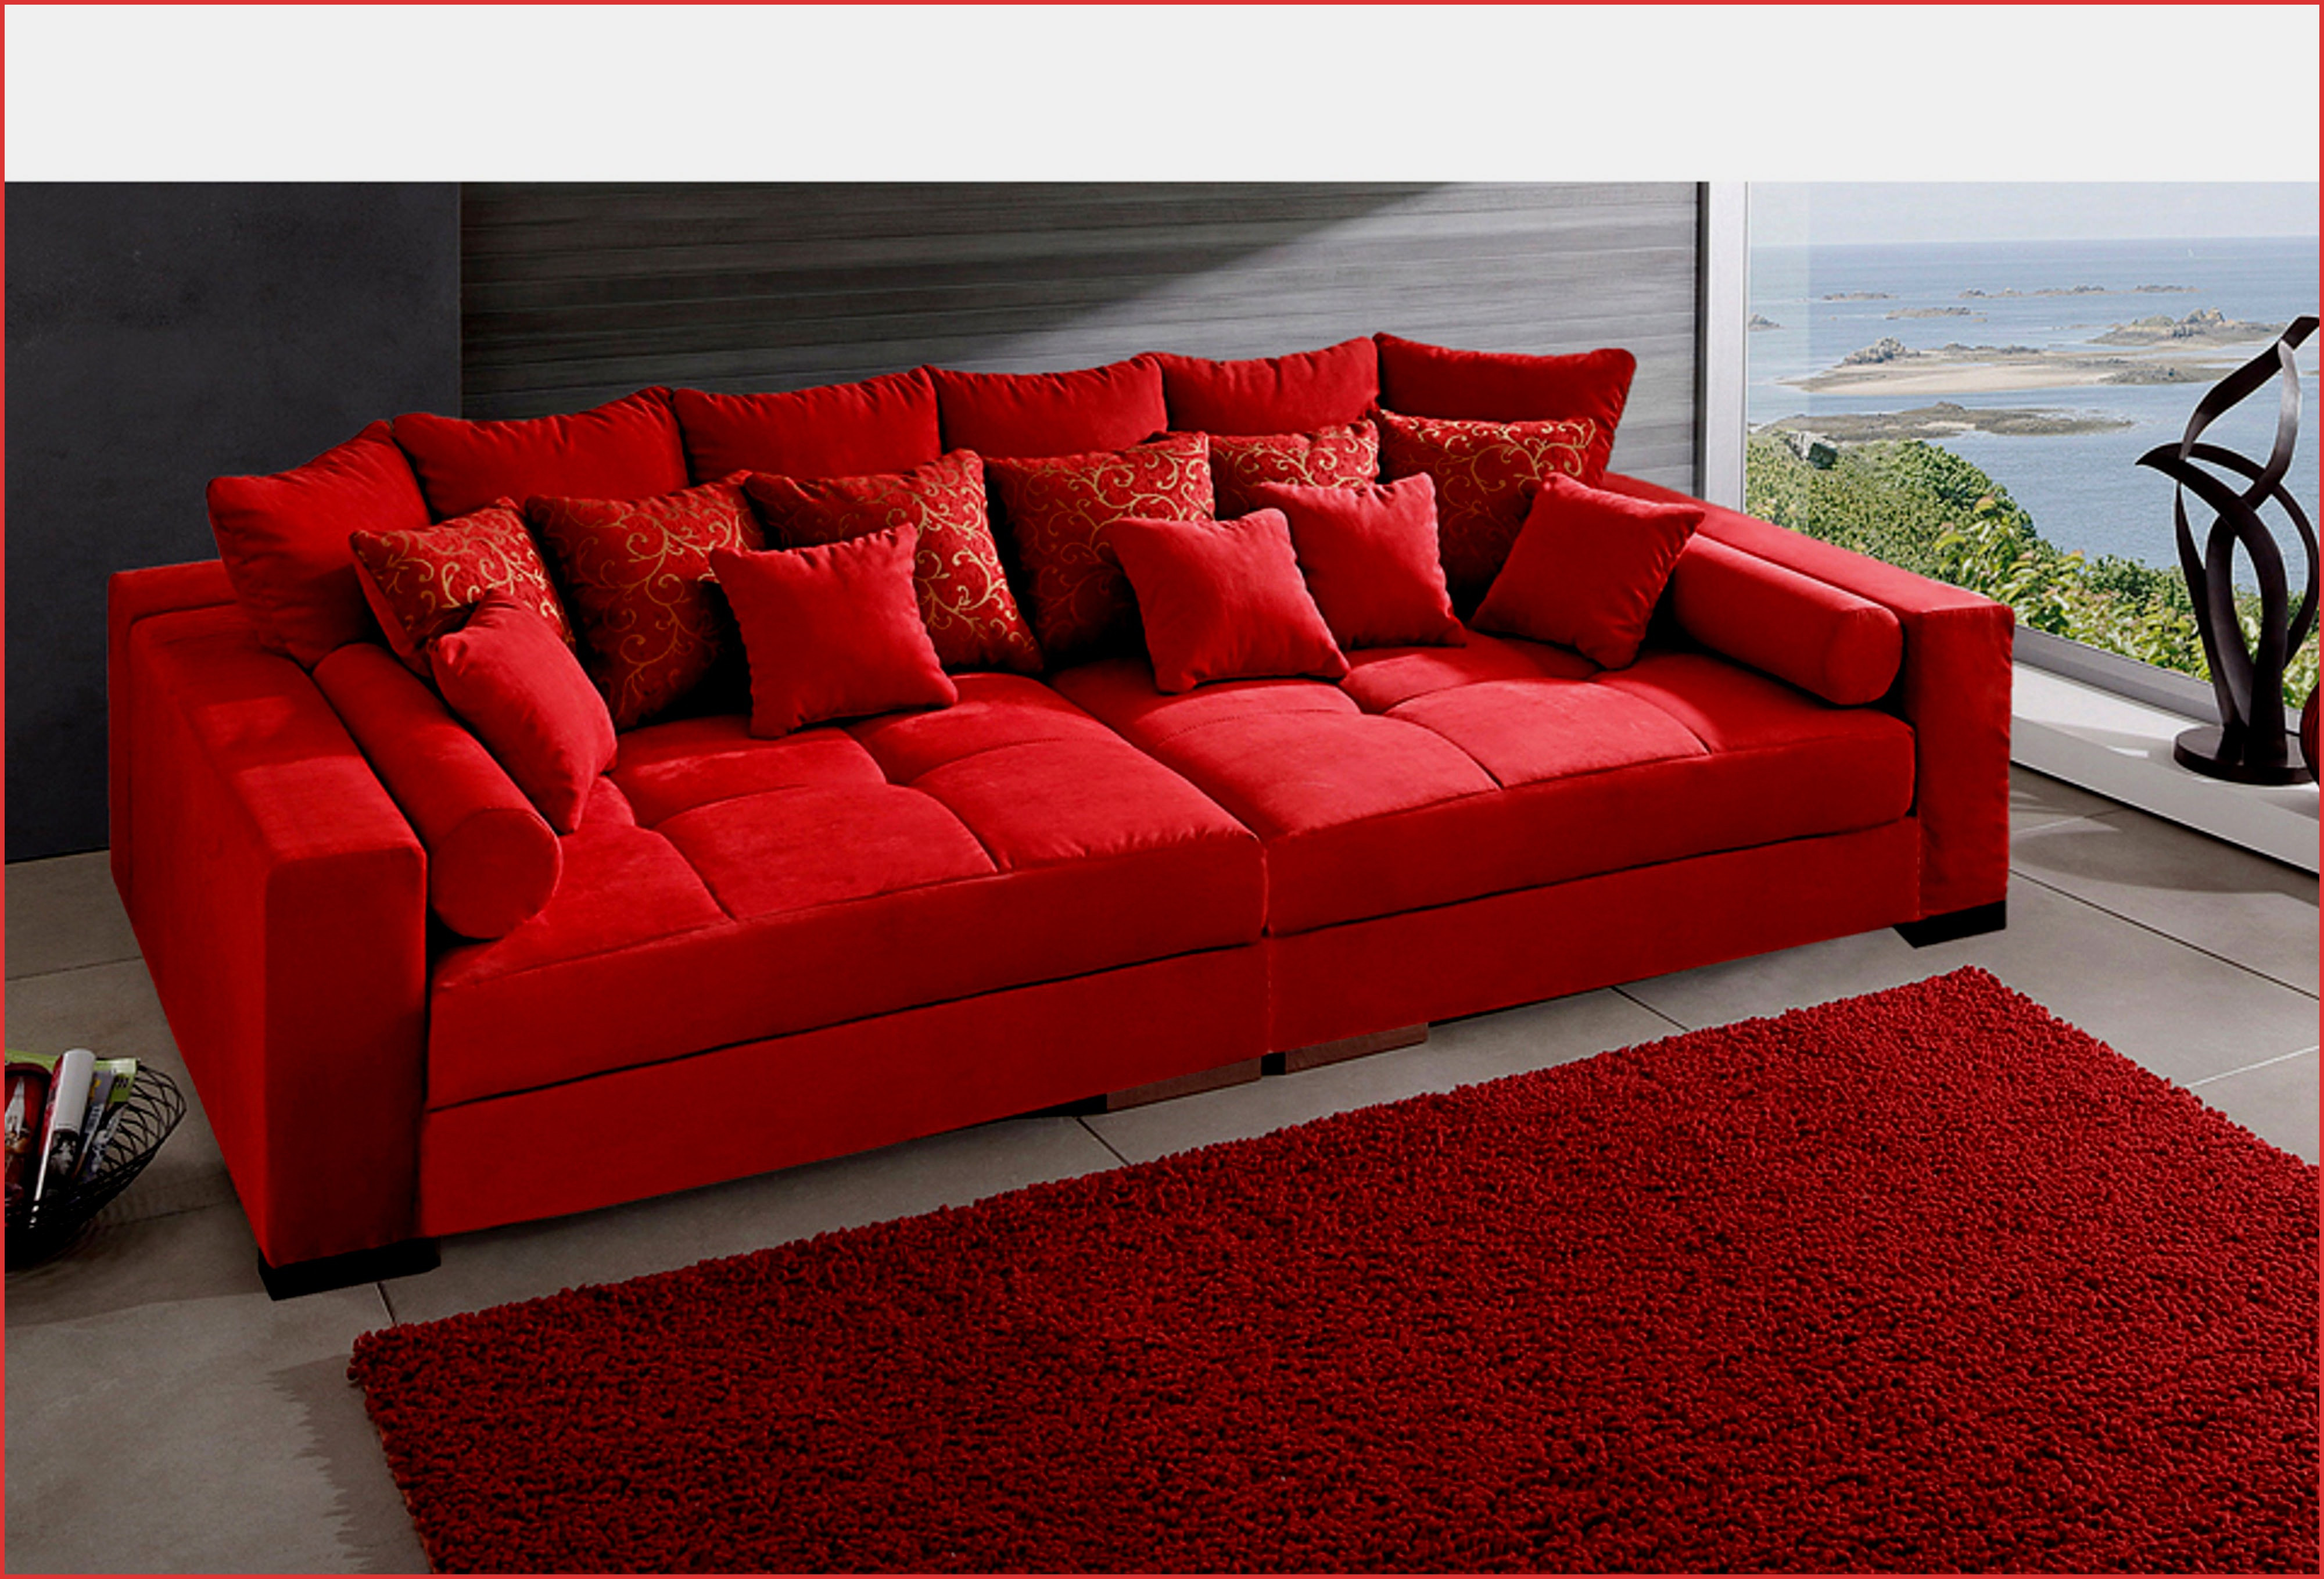 top 20 xxl sofa beste wohnkultur bastelideen coloring. Black Bedroom Furniture Sets. Home Design Ideas